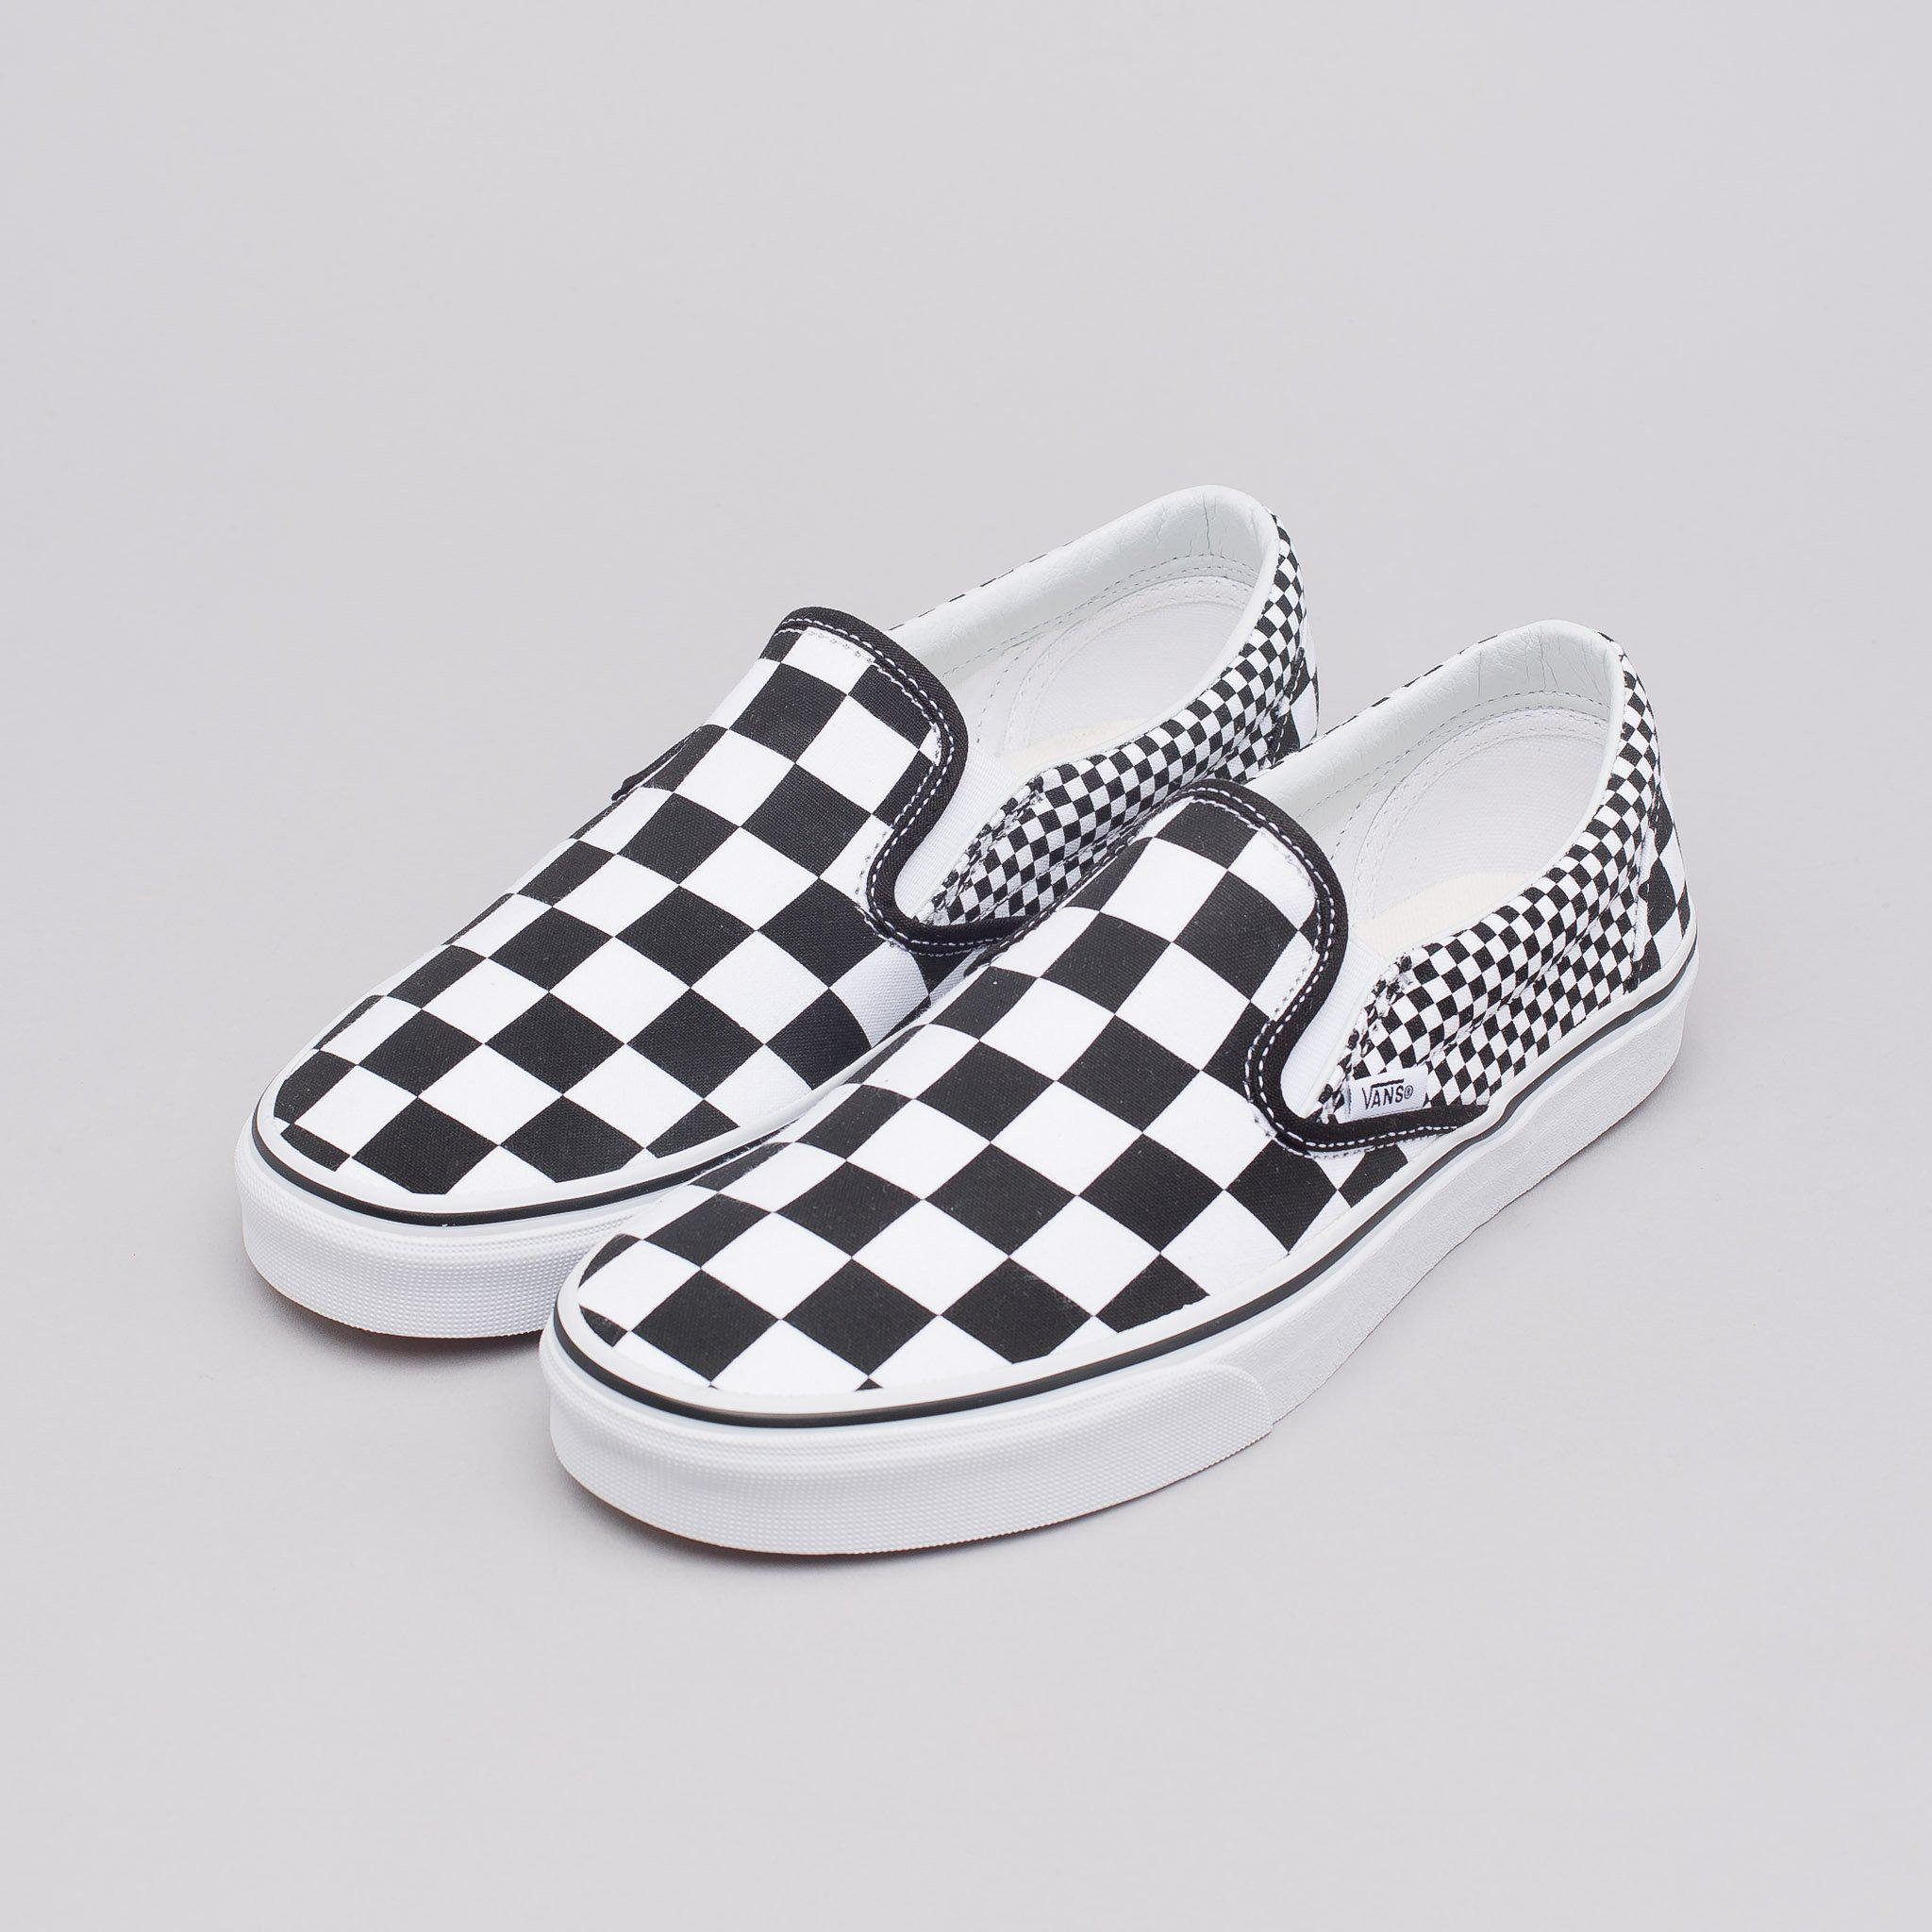 vans classic slip on checkerboard mix